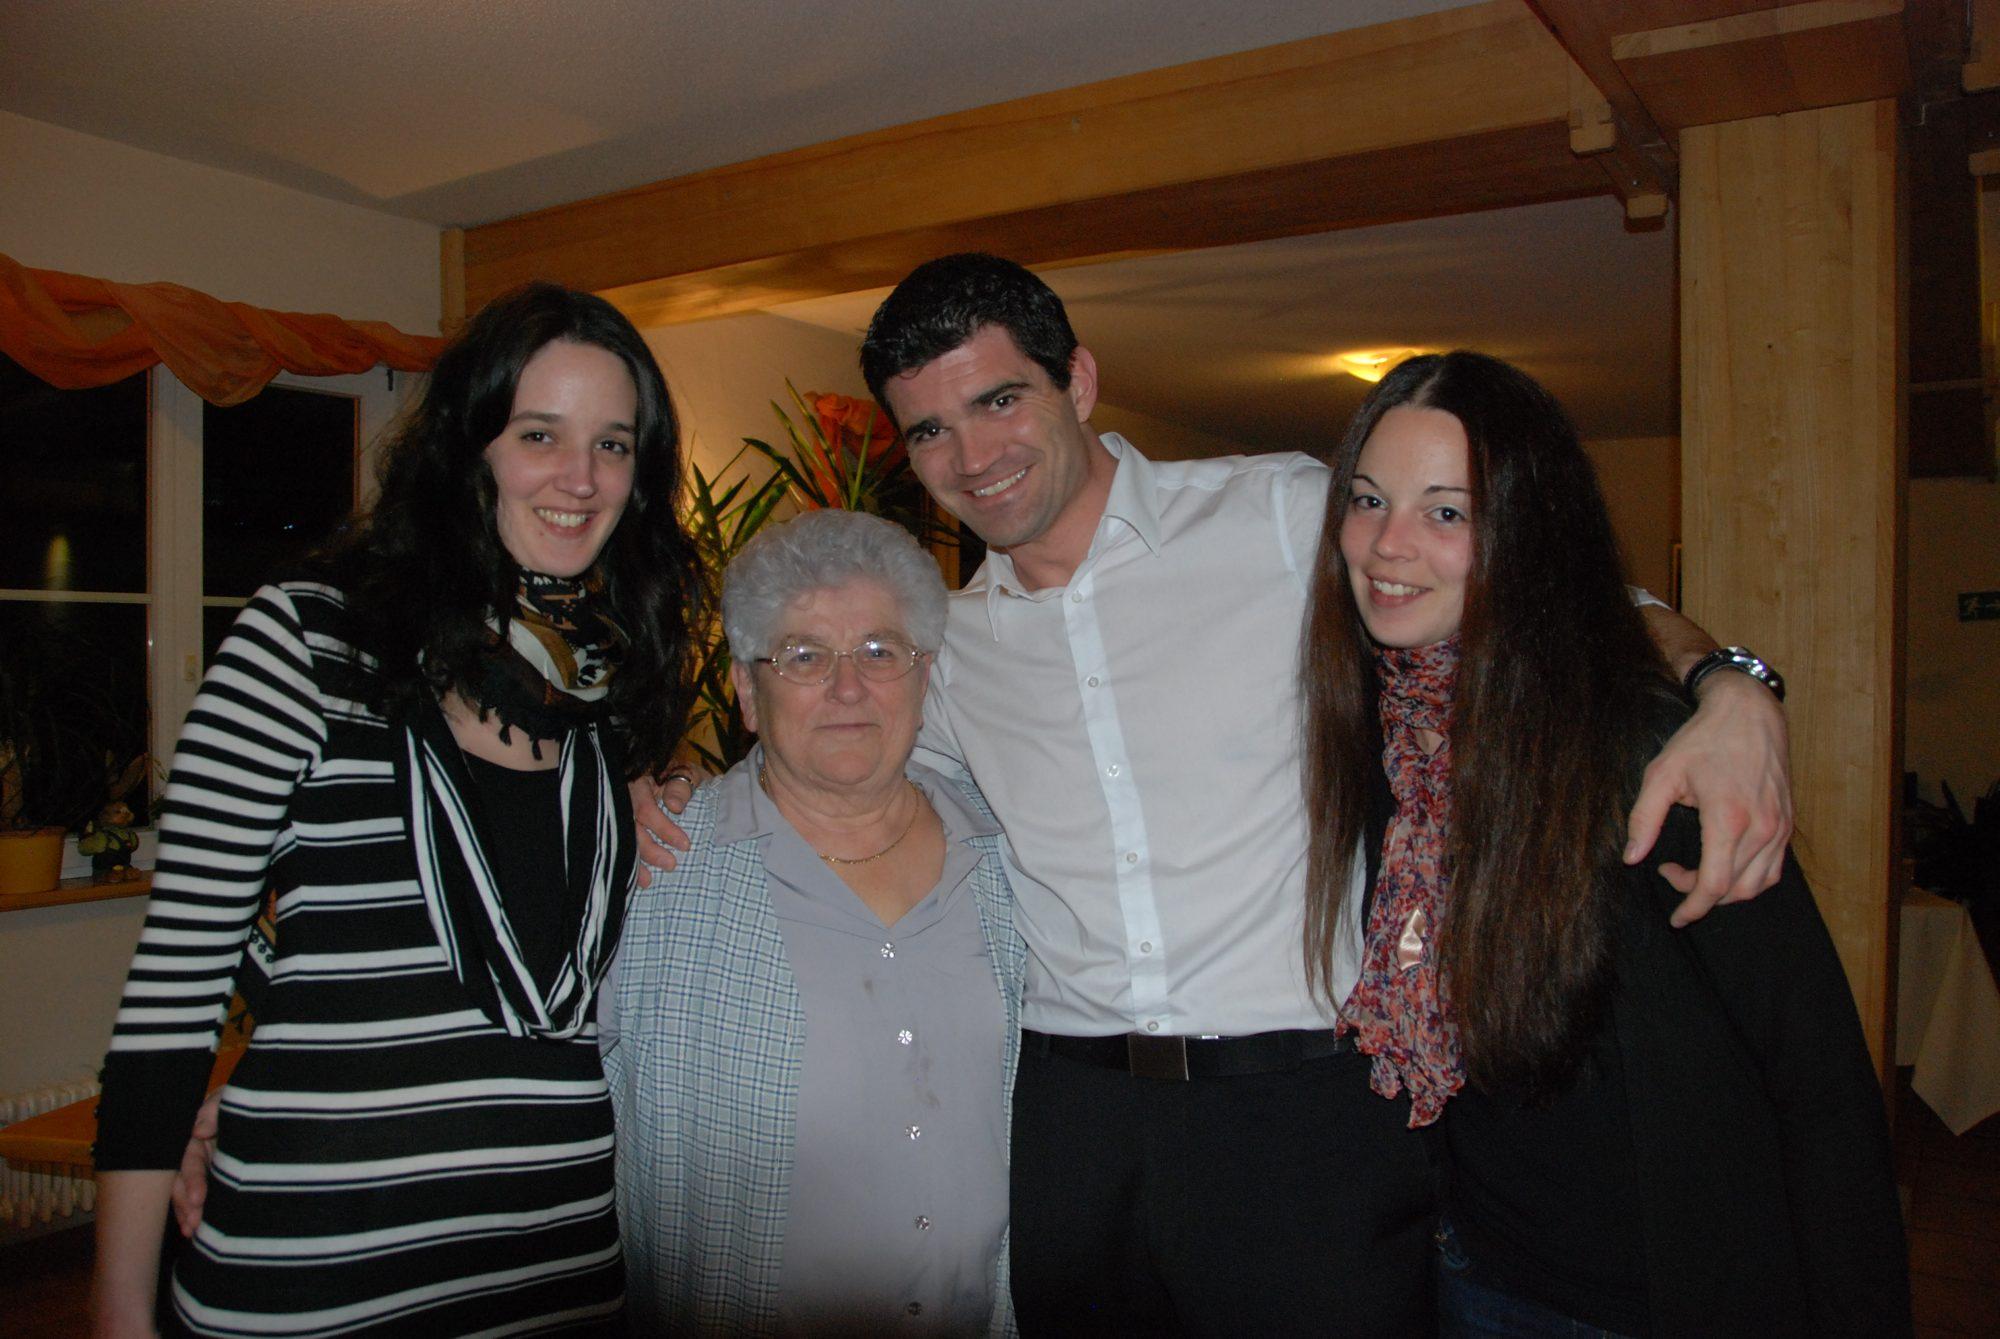 Tamara, Tante Anni, Thilo und Sabrina